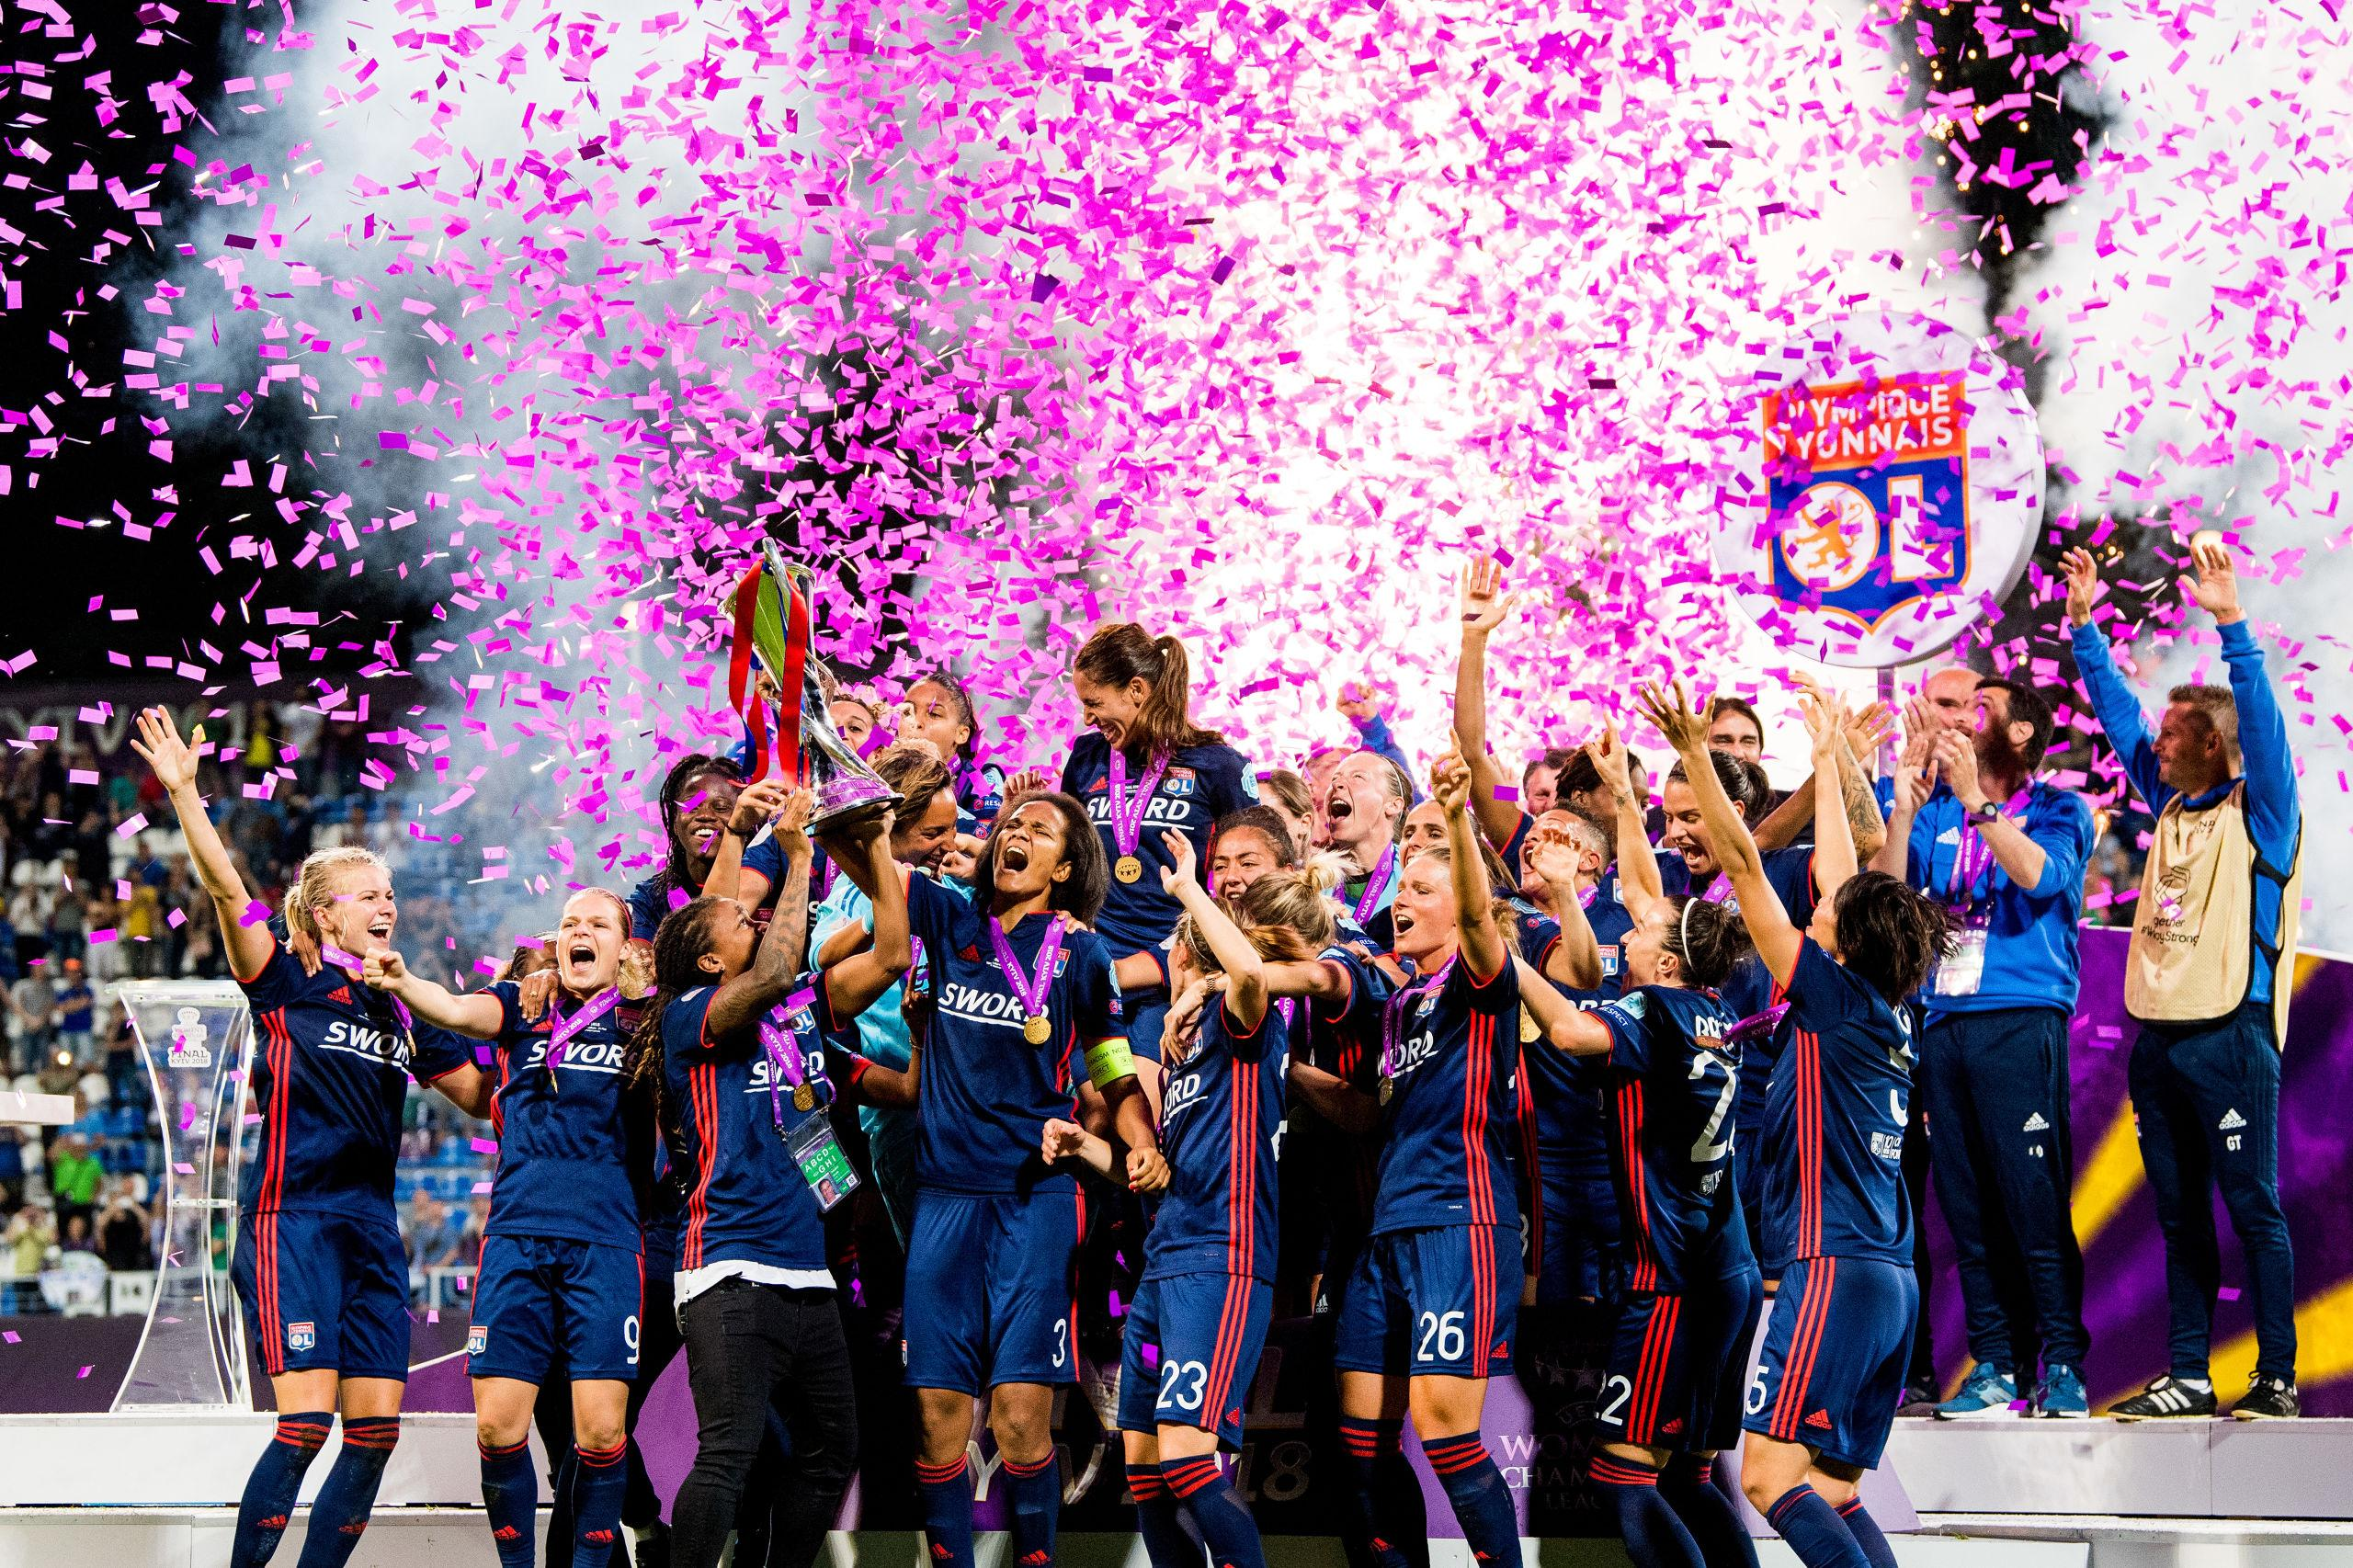 Lyon försvarar Champions League-titeln  da2f3d745302a